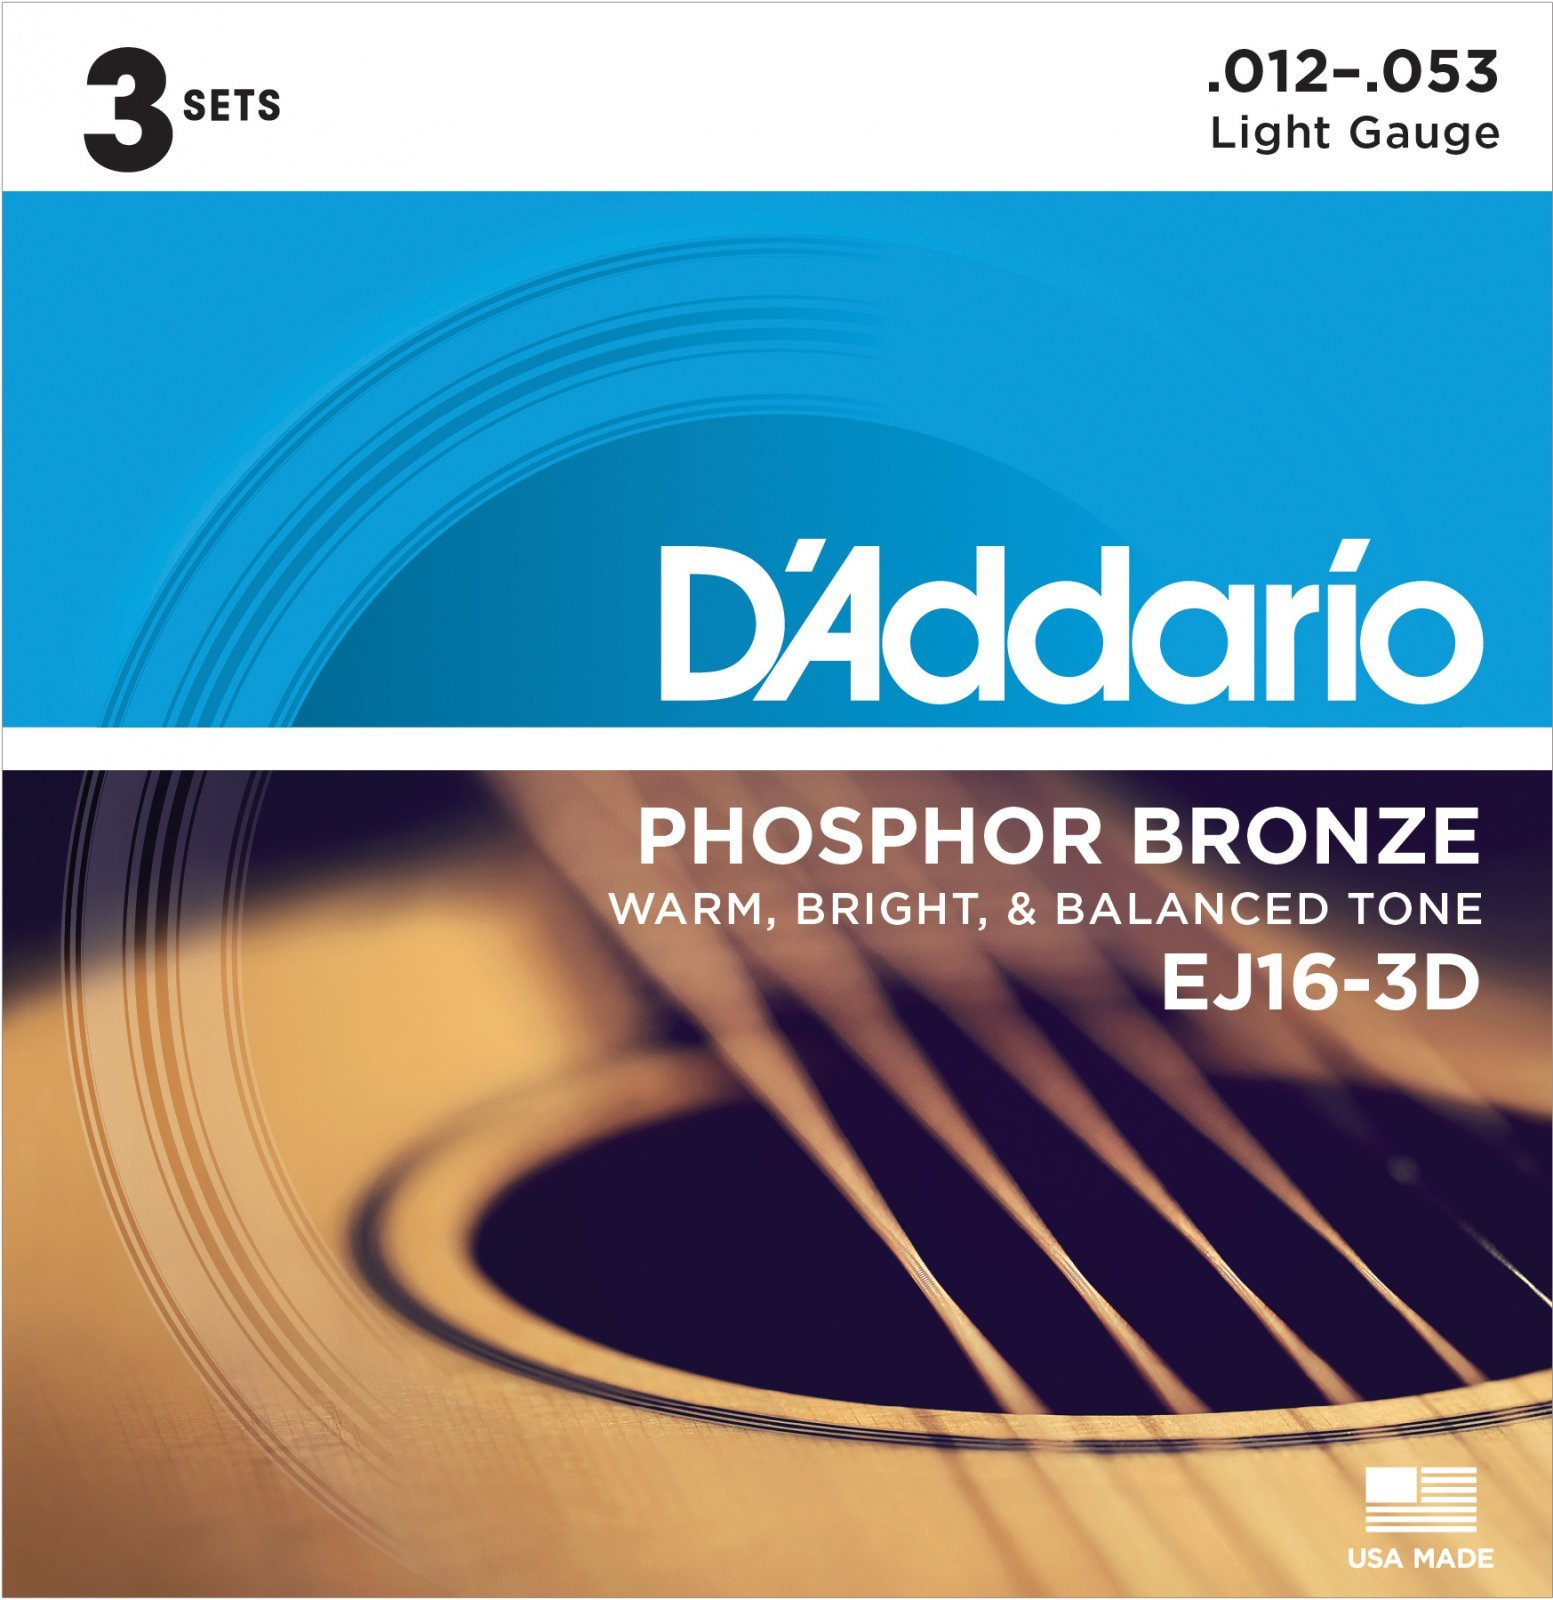 D'Addario EJ163D Phosphor Bronze Acoustic Light Strings three sets